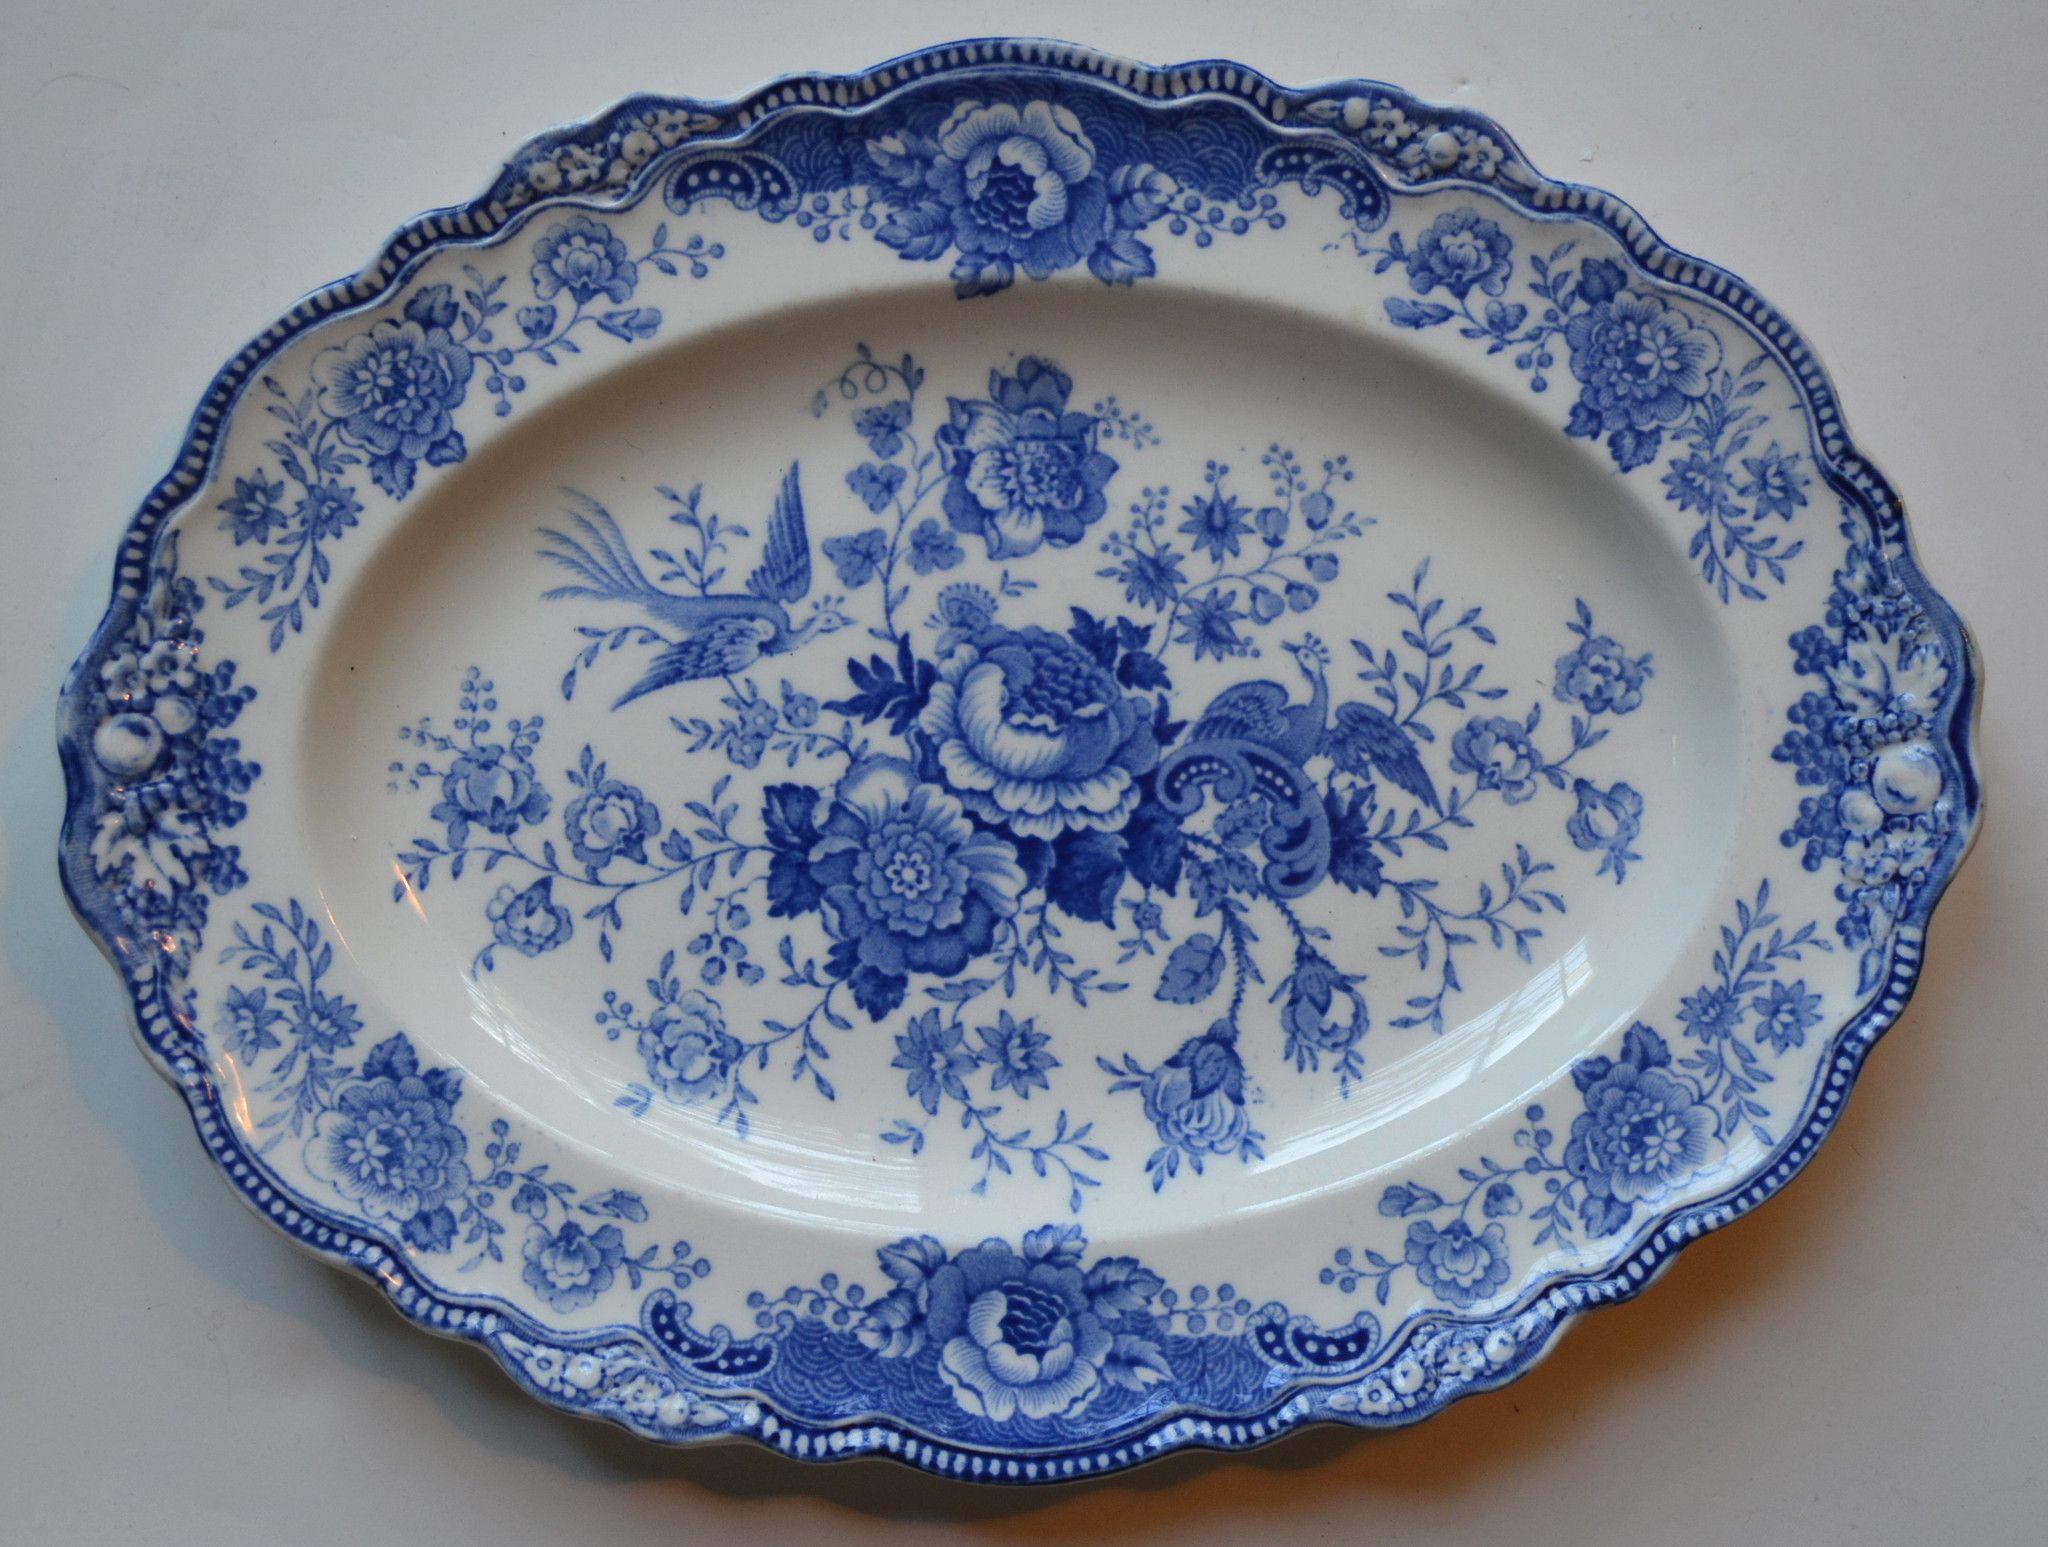 Turkey Sized Vintage Blue White Toile English Transferware Platter Bristol Birds Pheasants And Flowers Roses